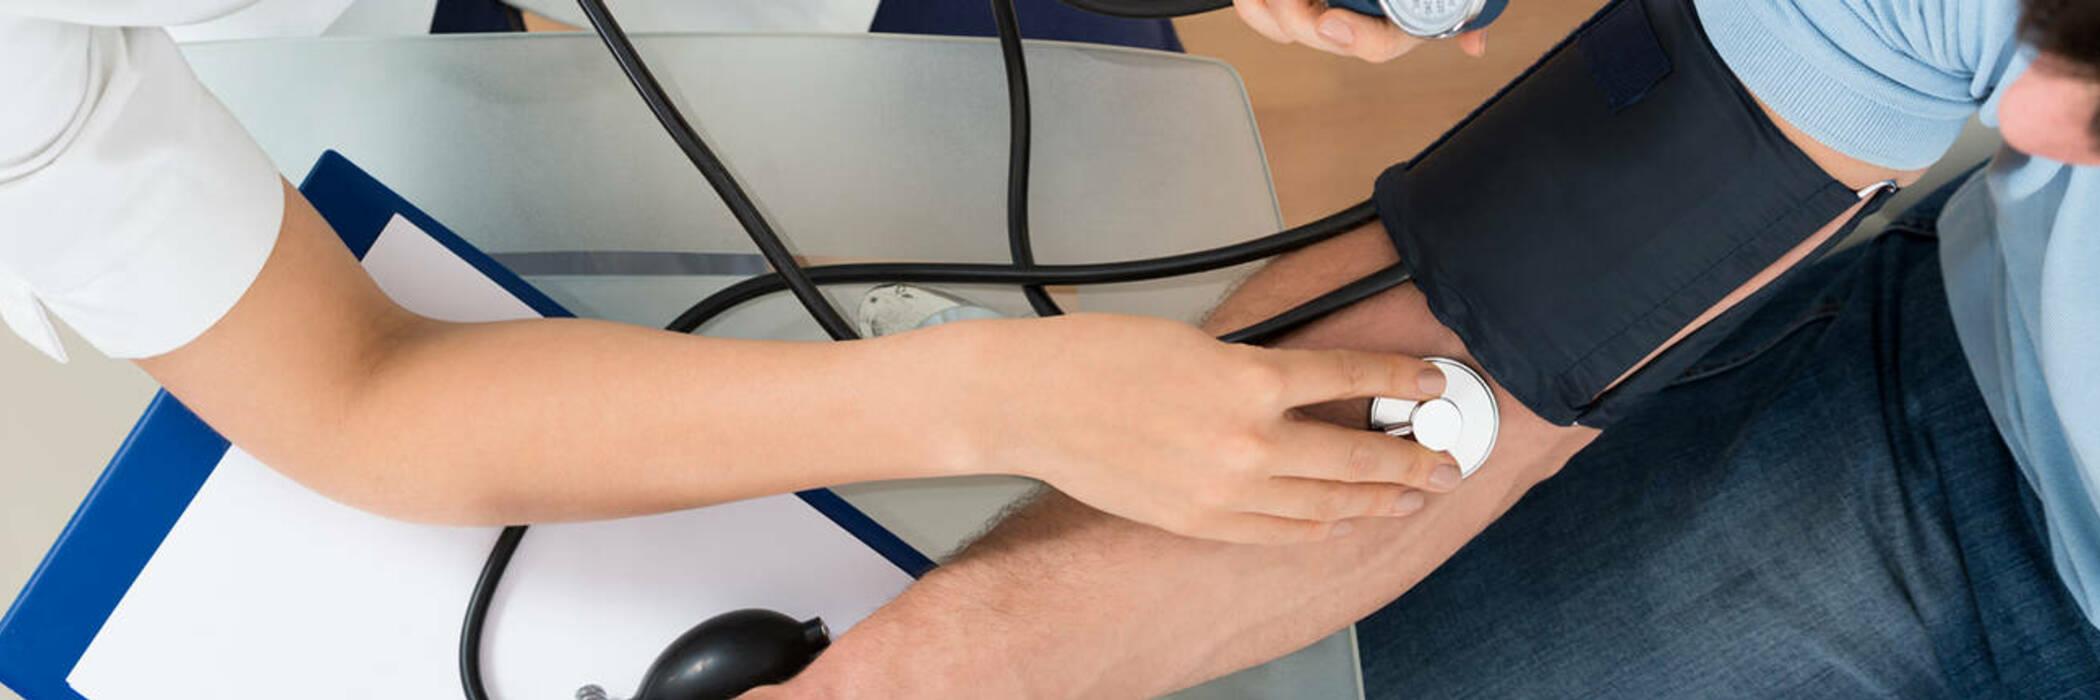 22nov health checkups hero